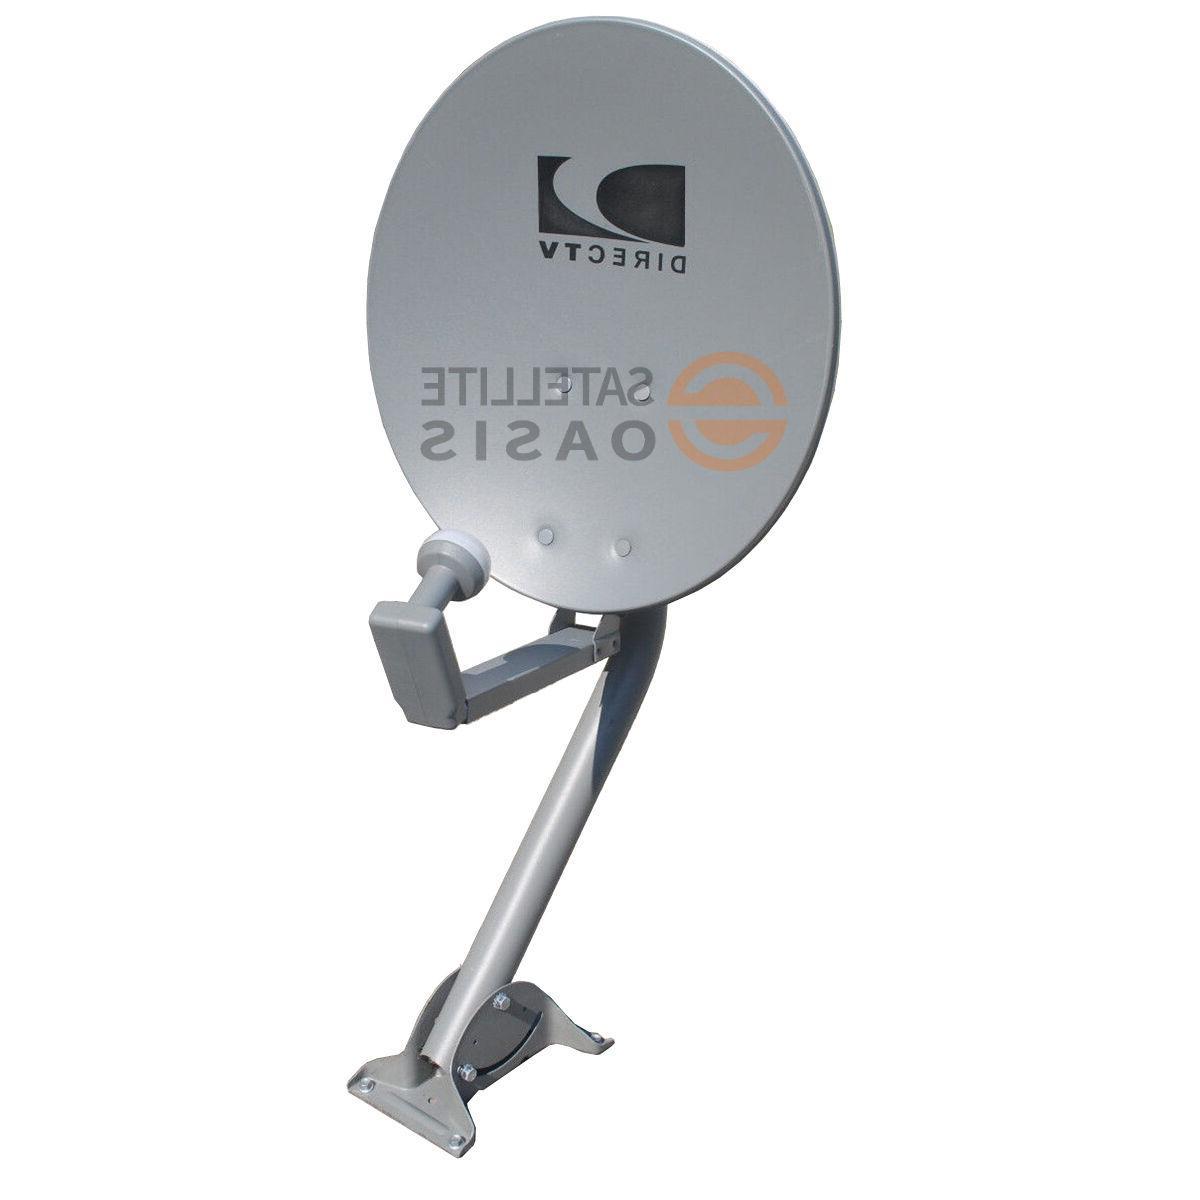 18 inch satellite dish antenna